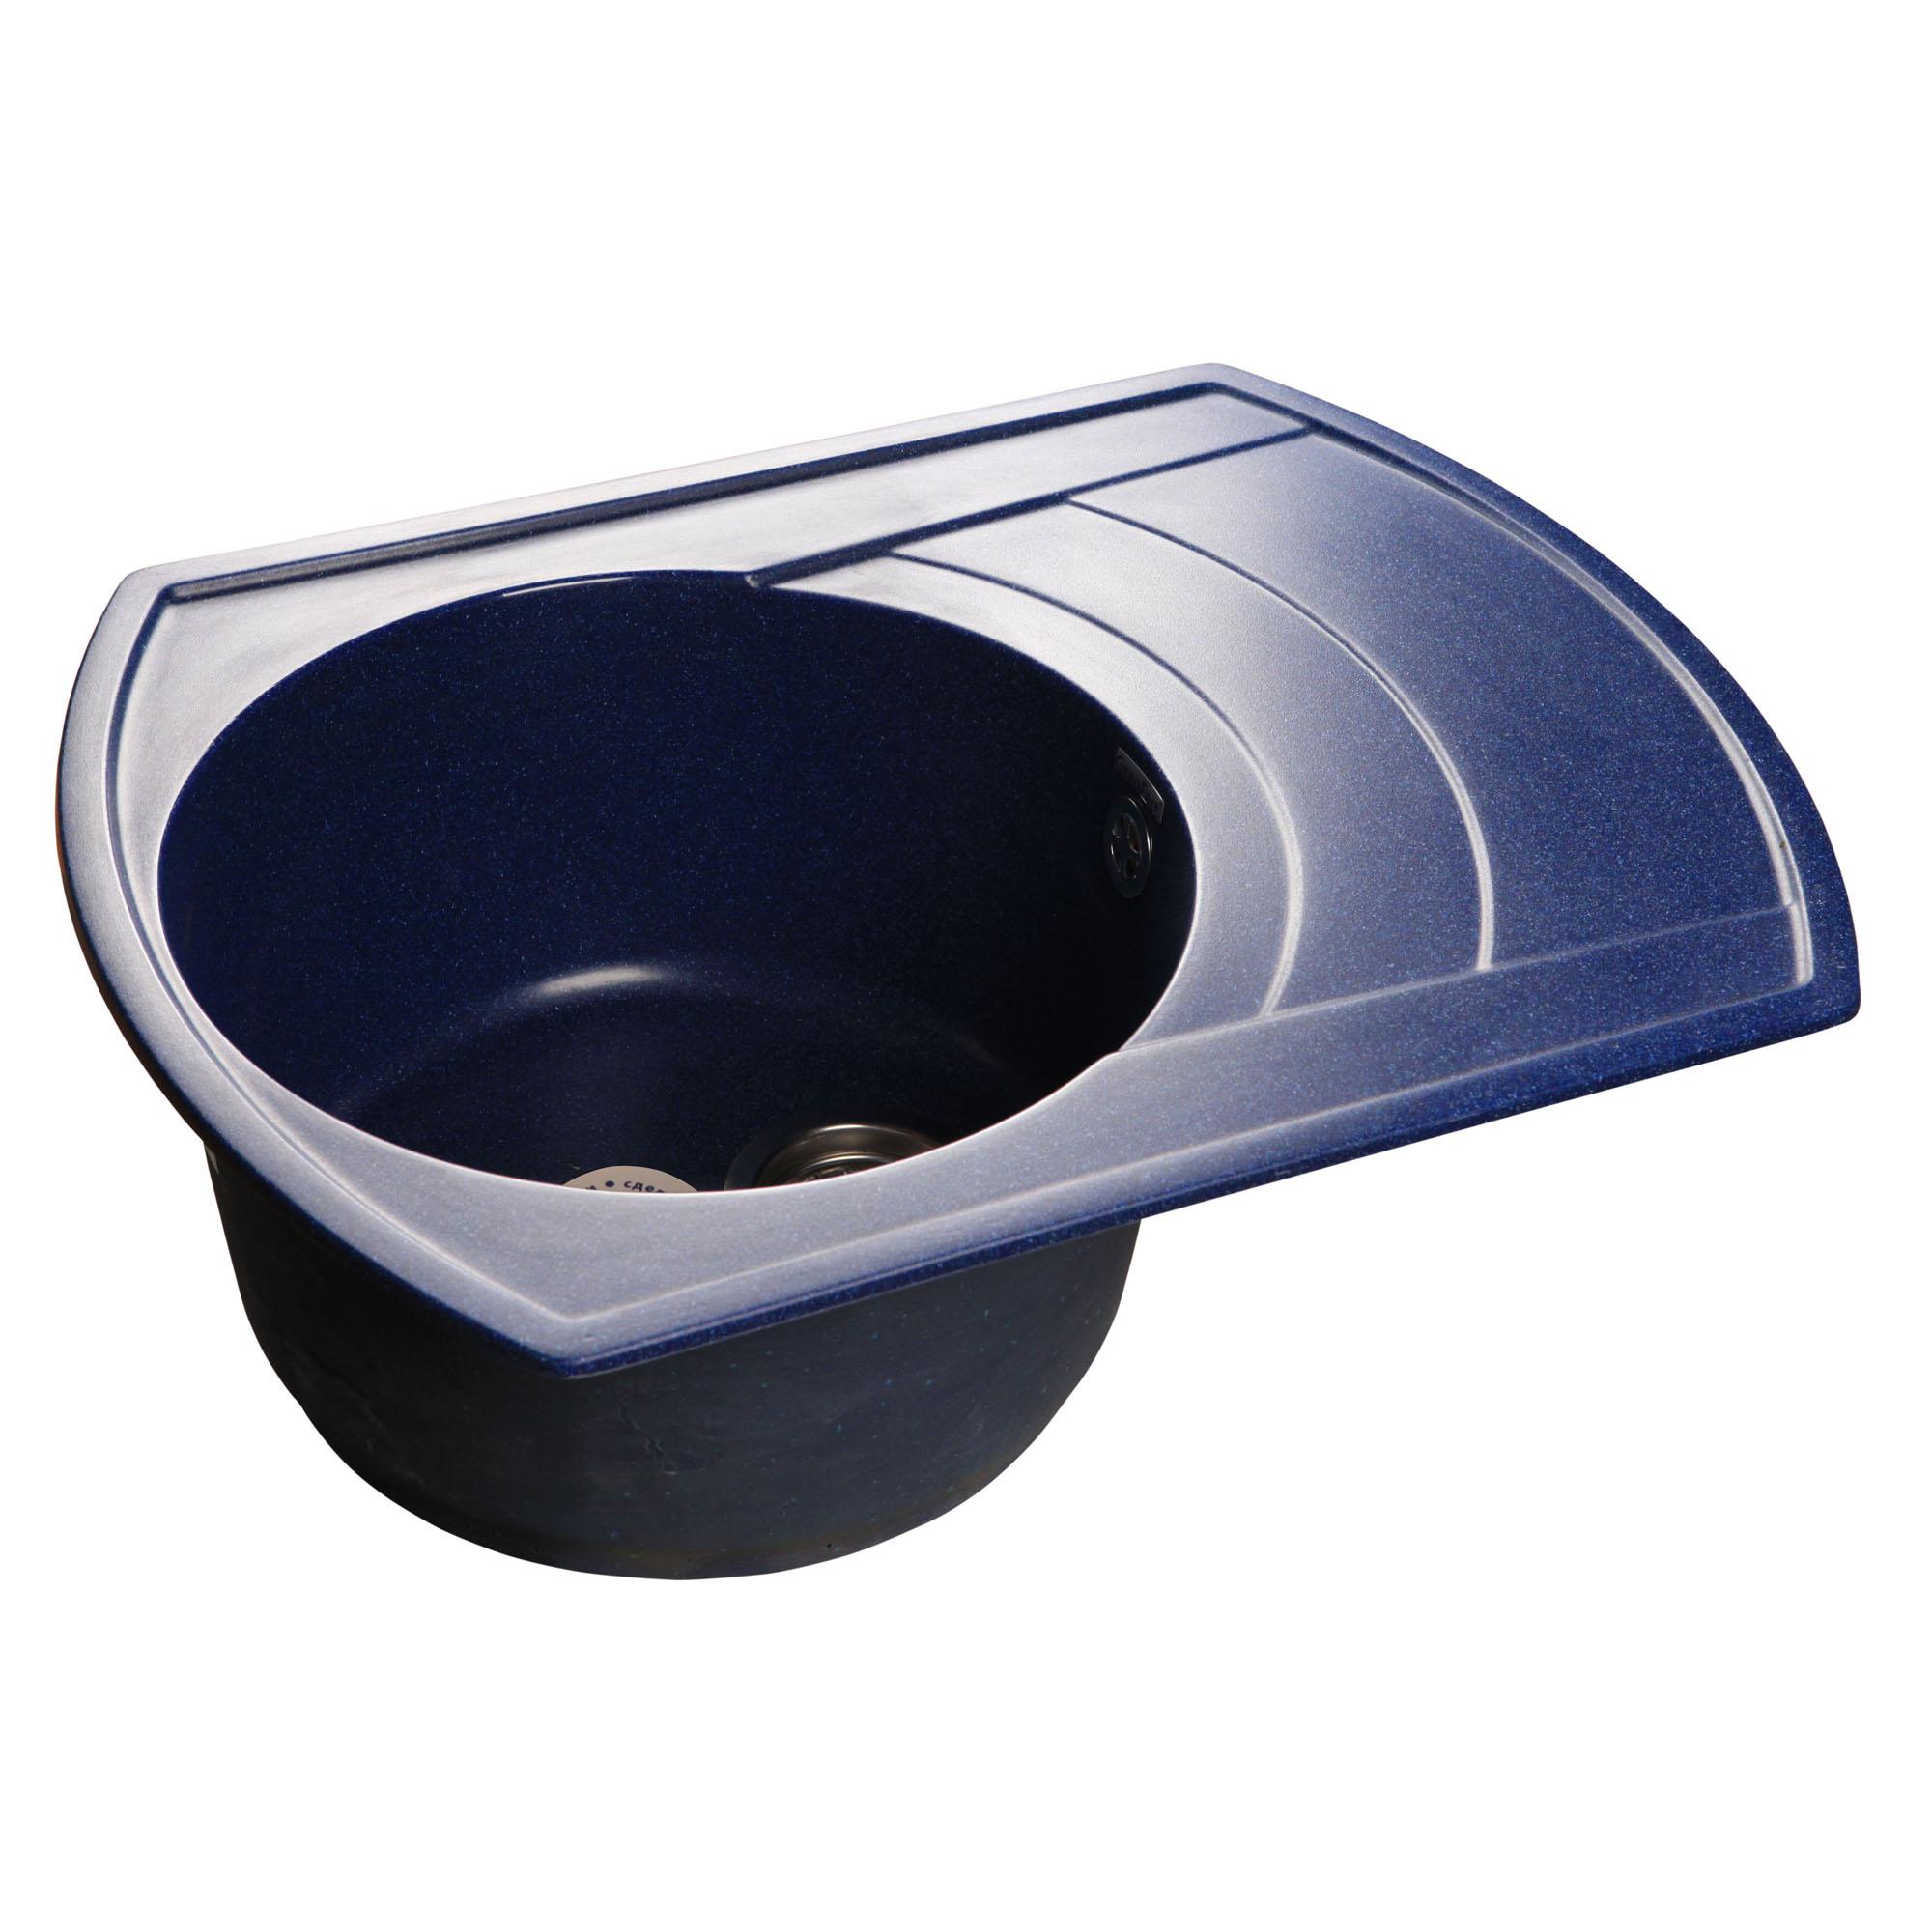 Кухонная мойка GranFest Rondo GF-R650L синий мойка кухонная granfest гранит 650x500 чаша крыло gf r650l черная